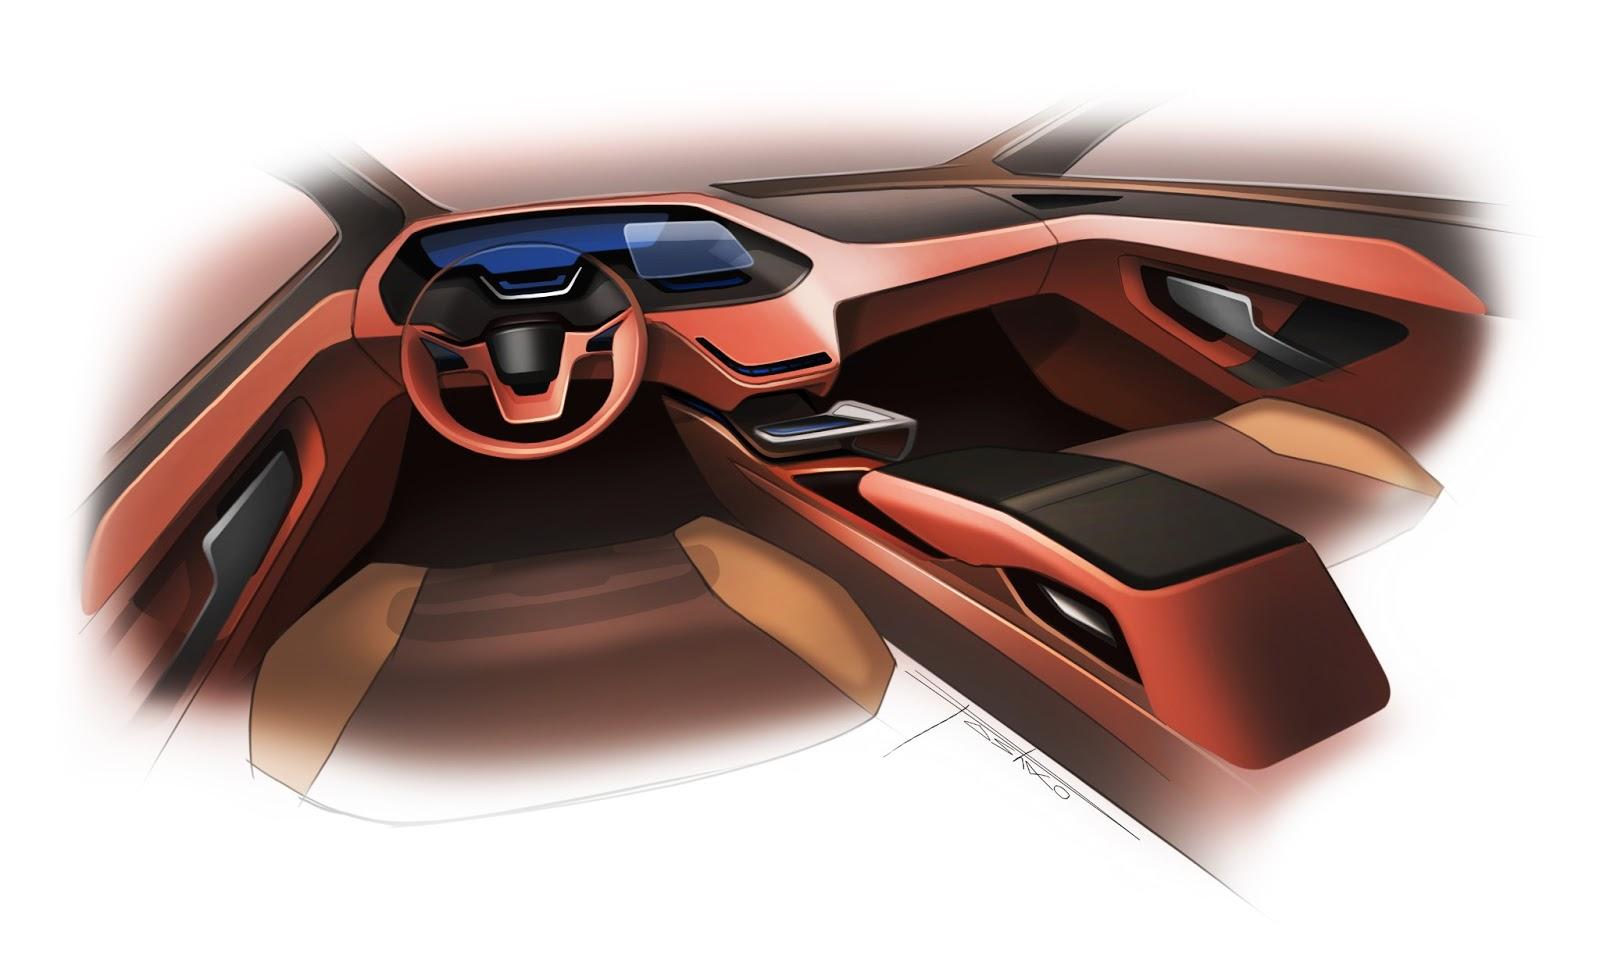 ... : 2020 Honda Odyssey , 2020 Honda Accord , 2020 Cars , 2020 Mustang